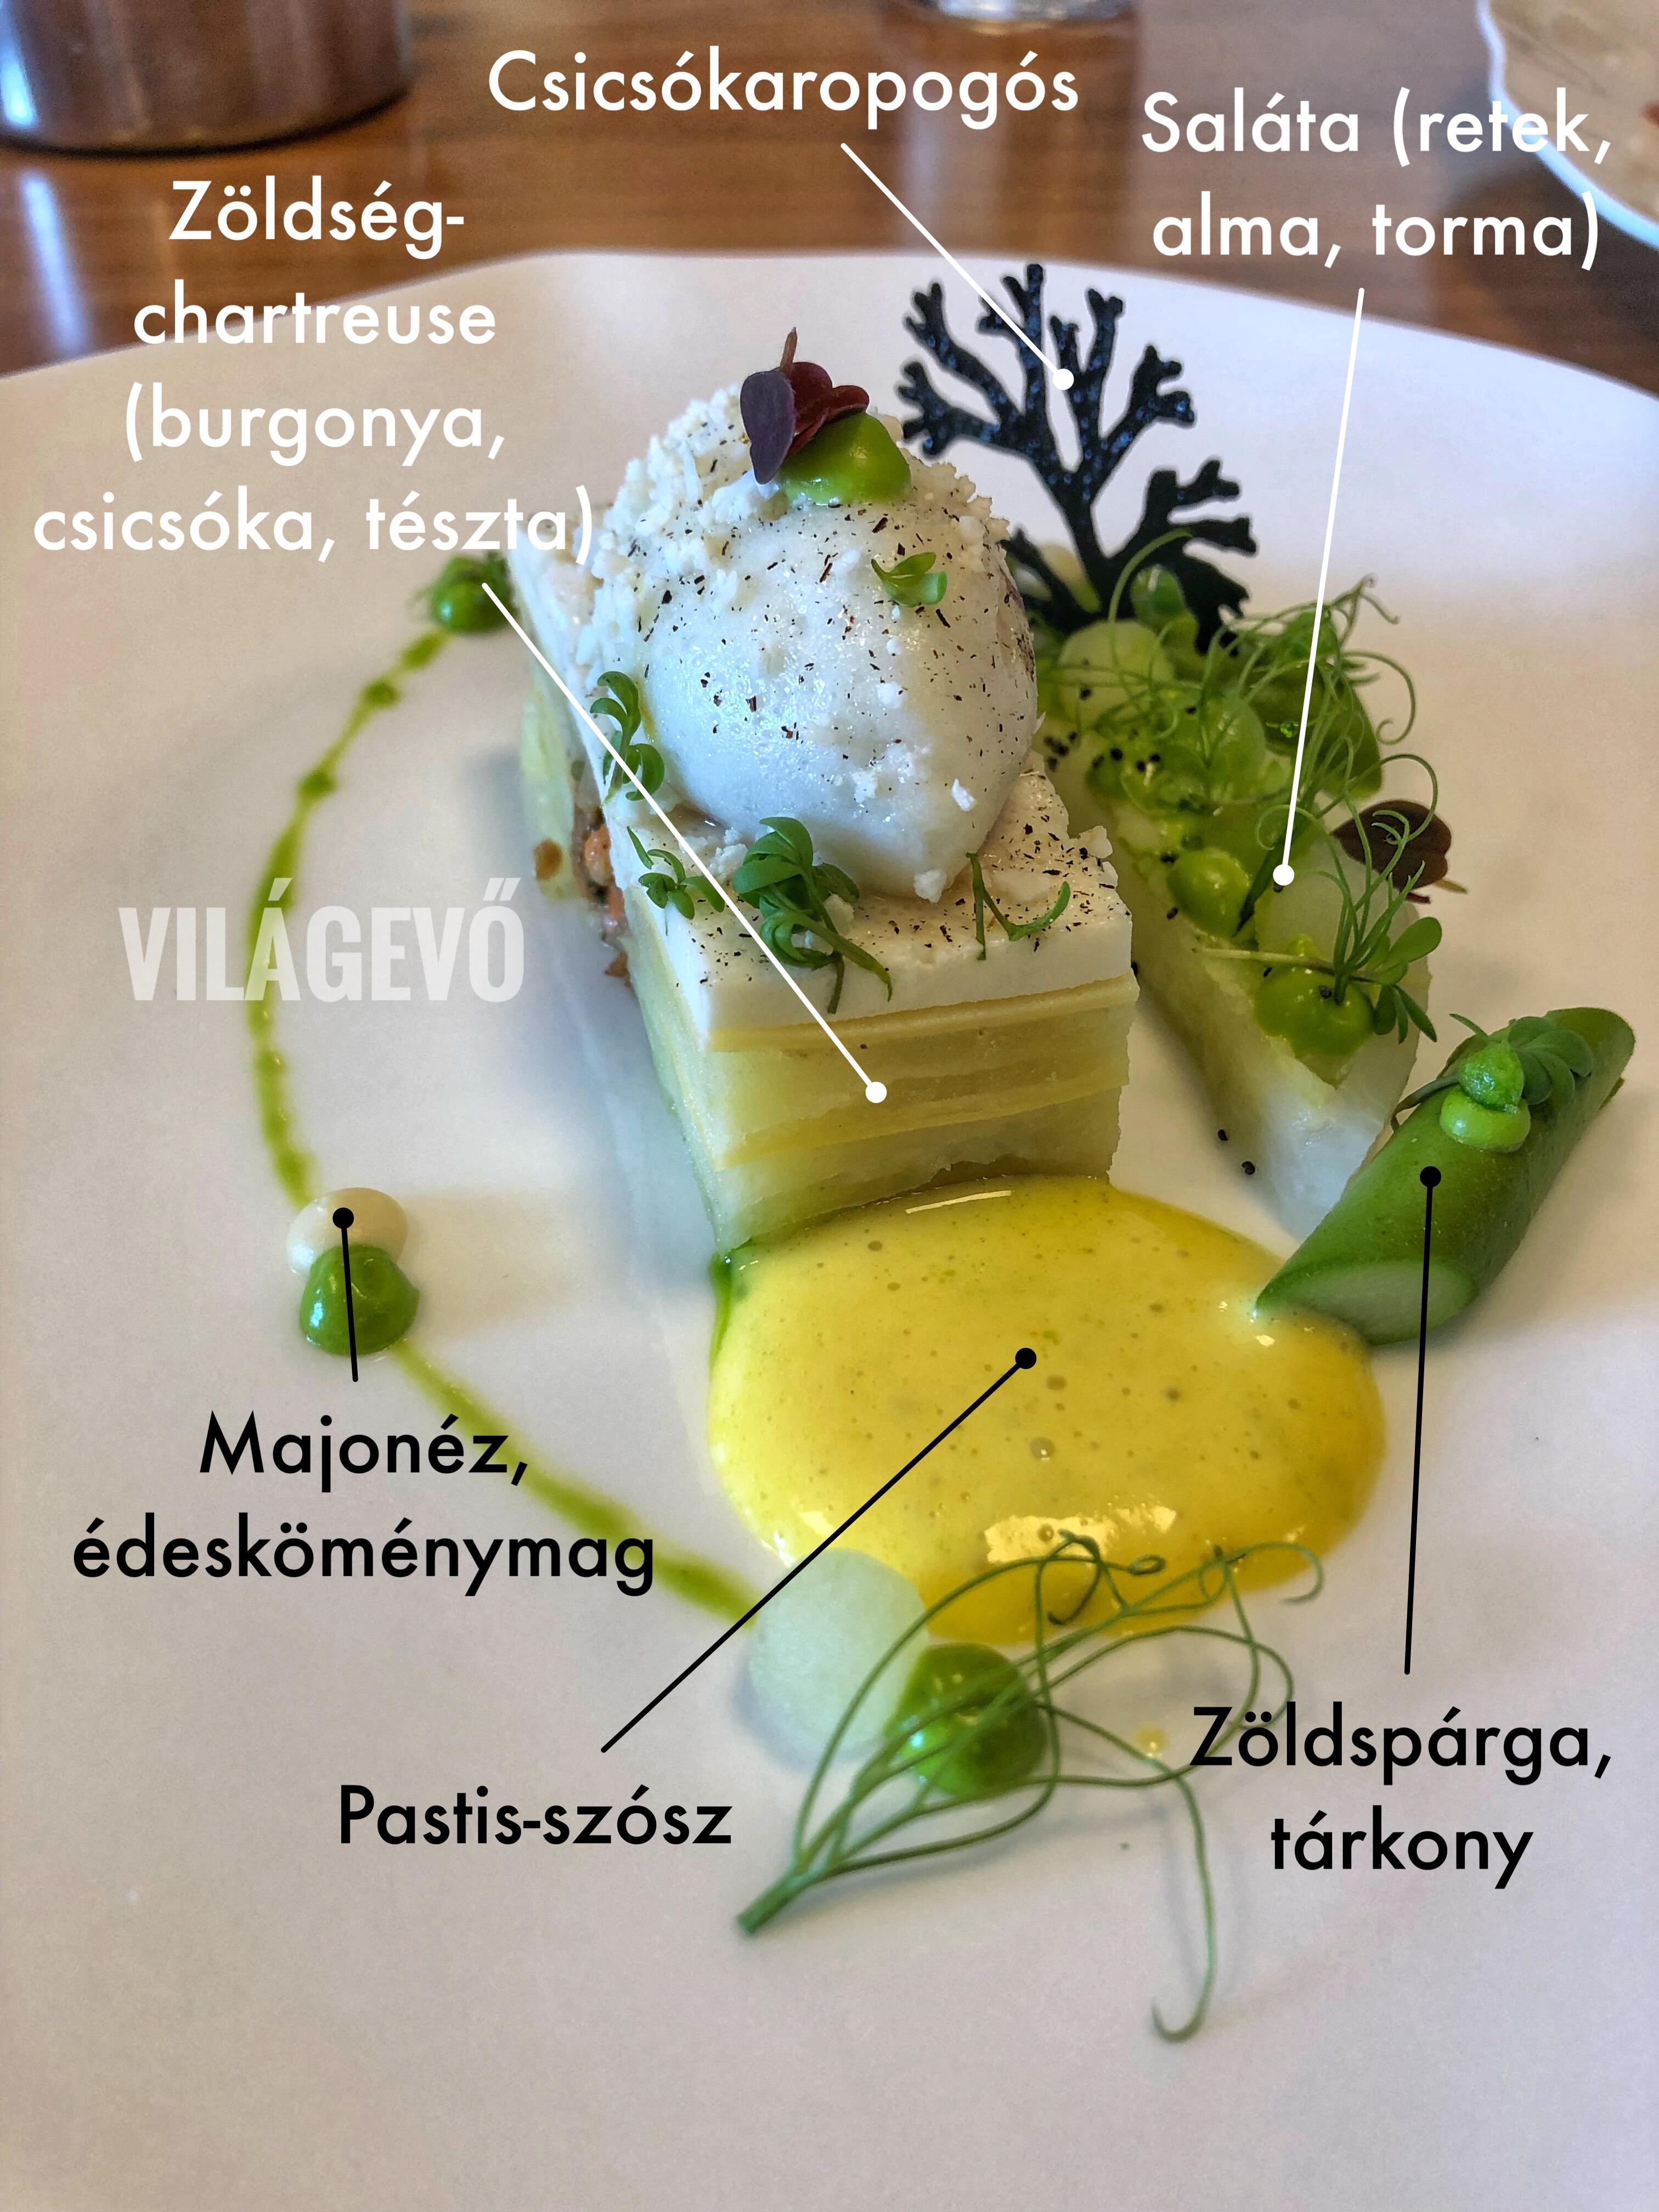 bocuse_d_or_zoldseg_chartreuse_magyar_csapat_pohner_vilagevo.JPG